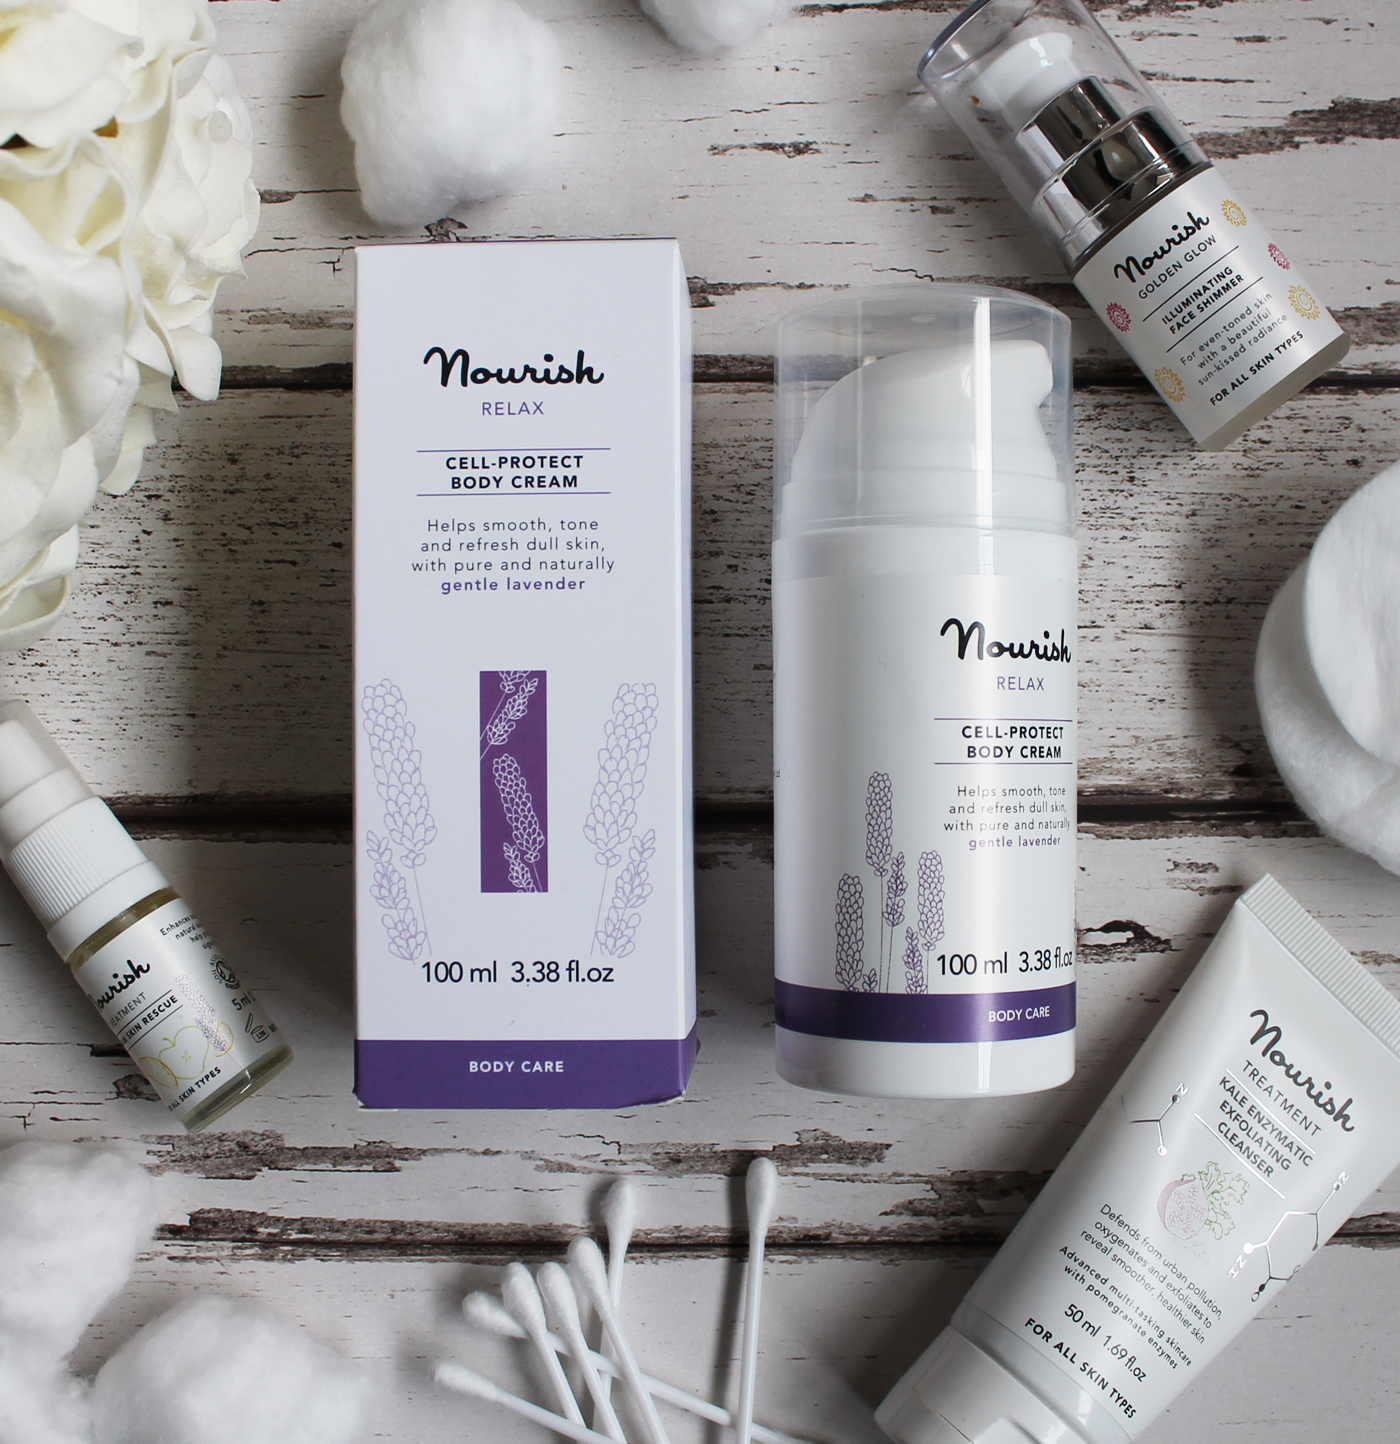 Nourish, Nourish relax cell protect body cream, Nourish Skincare